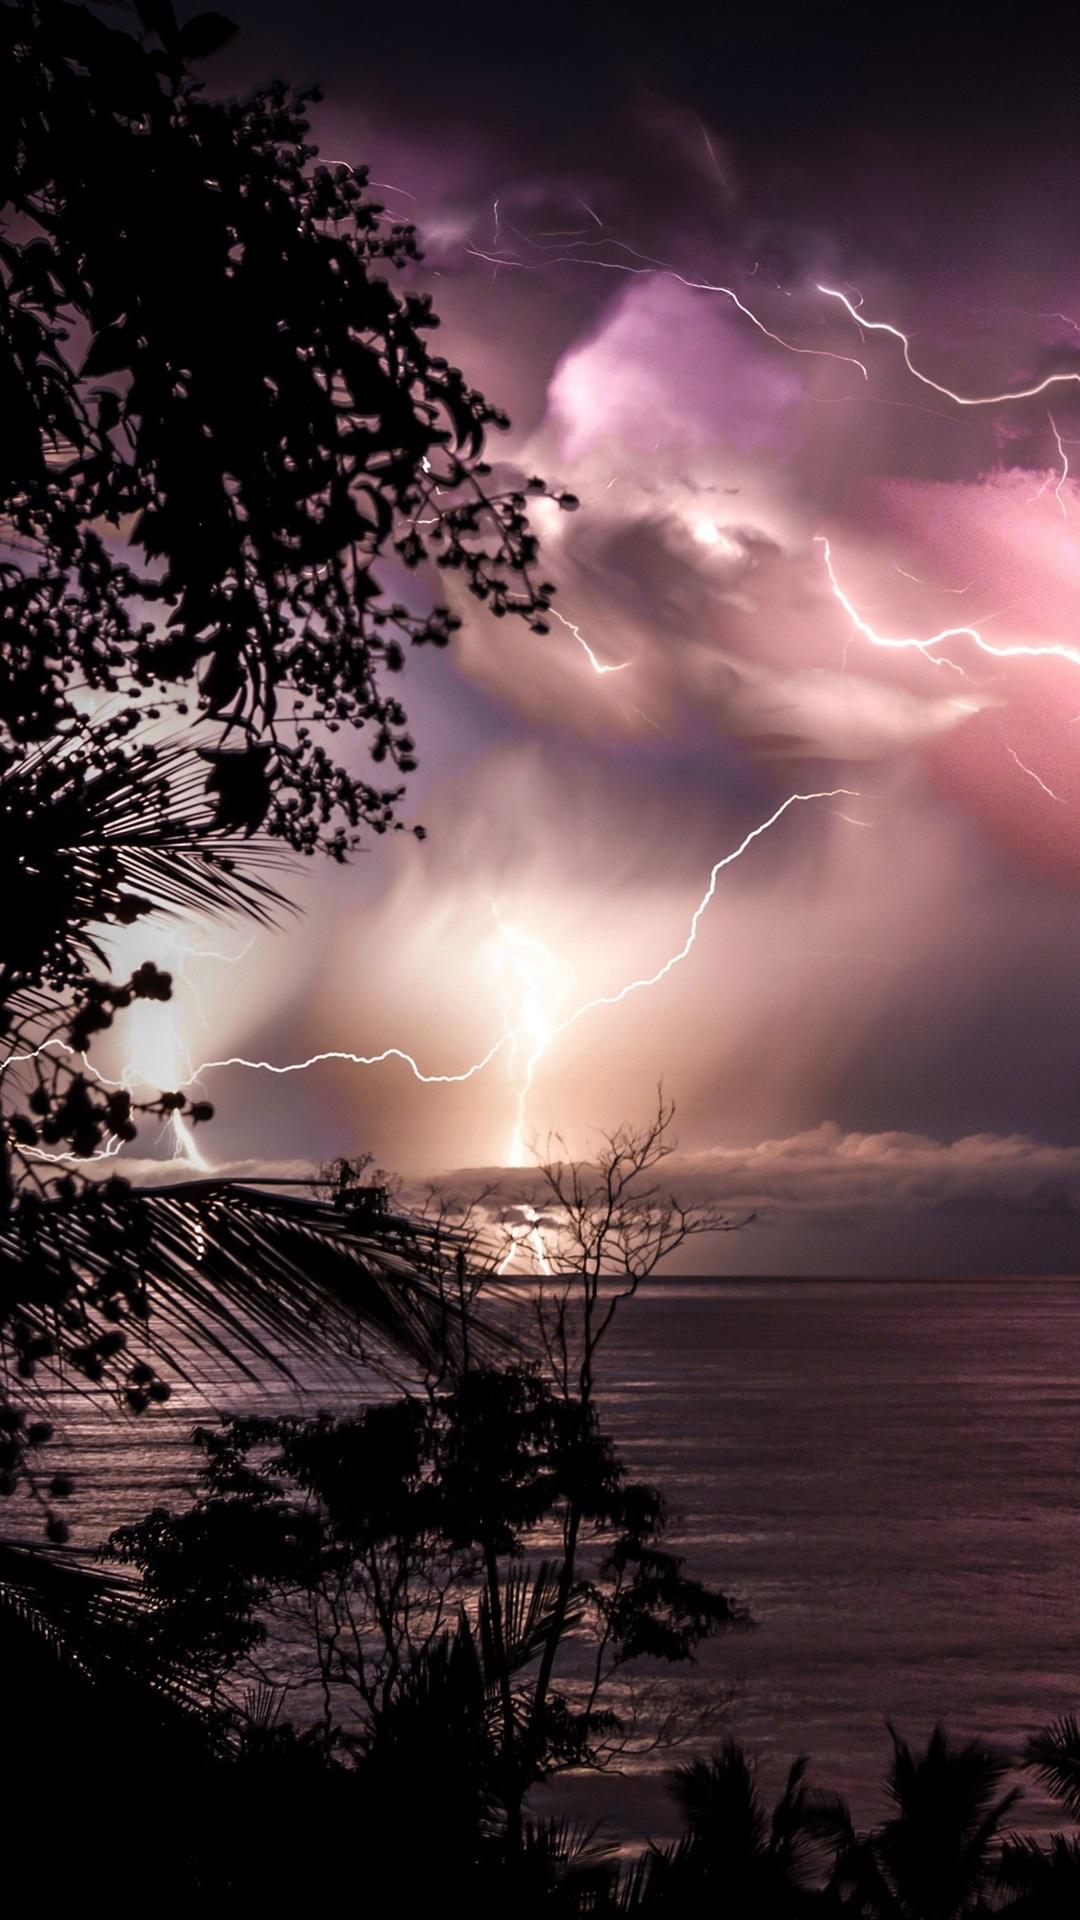 Costa Rica Night Sea Clouds Lightning 1080x1920 Iphone 8 7 6 6s